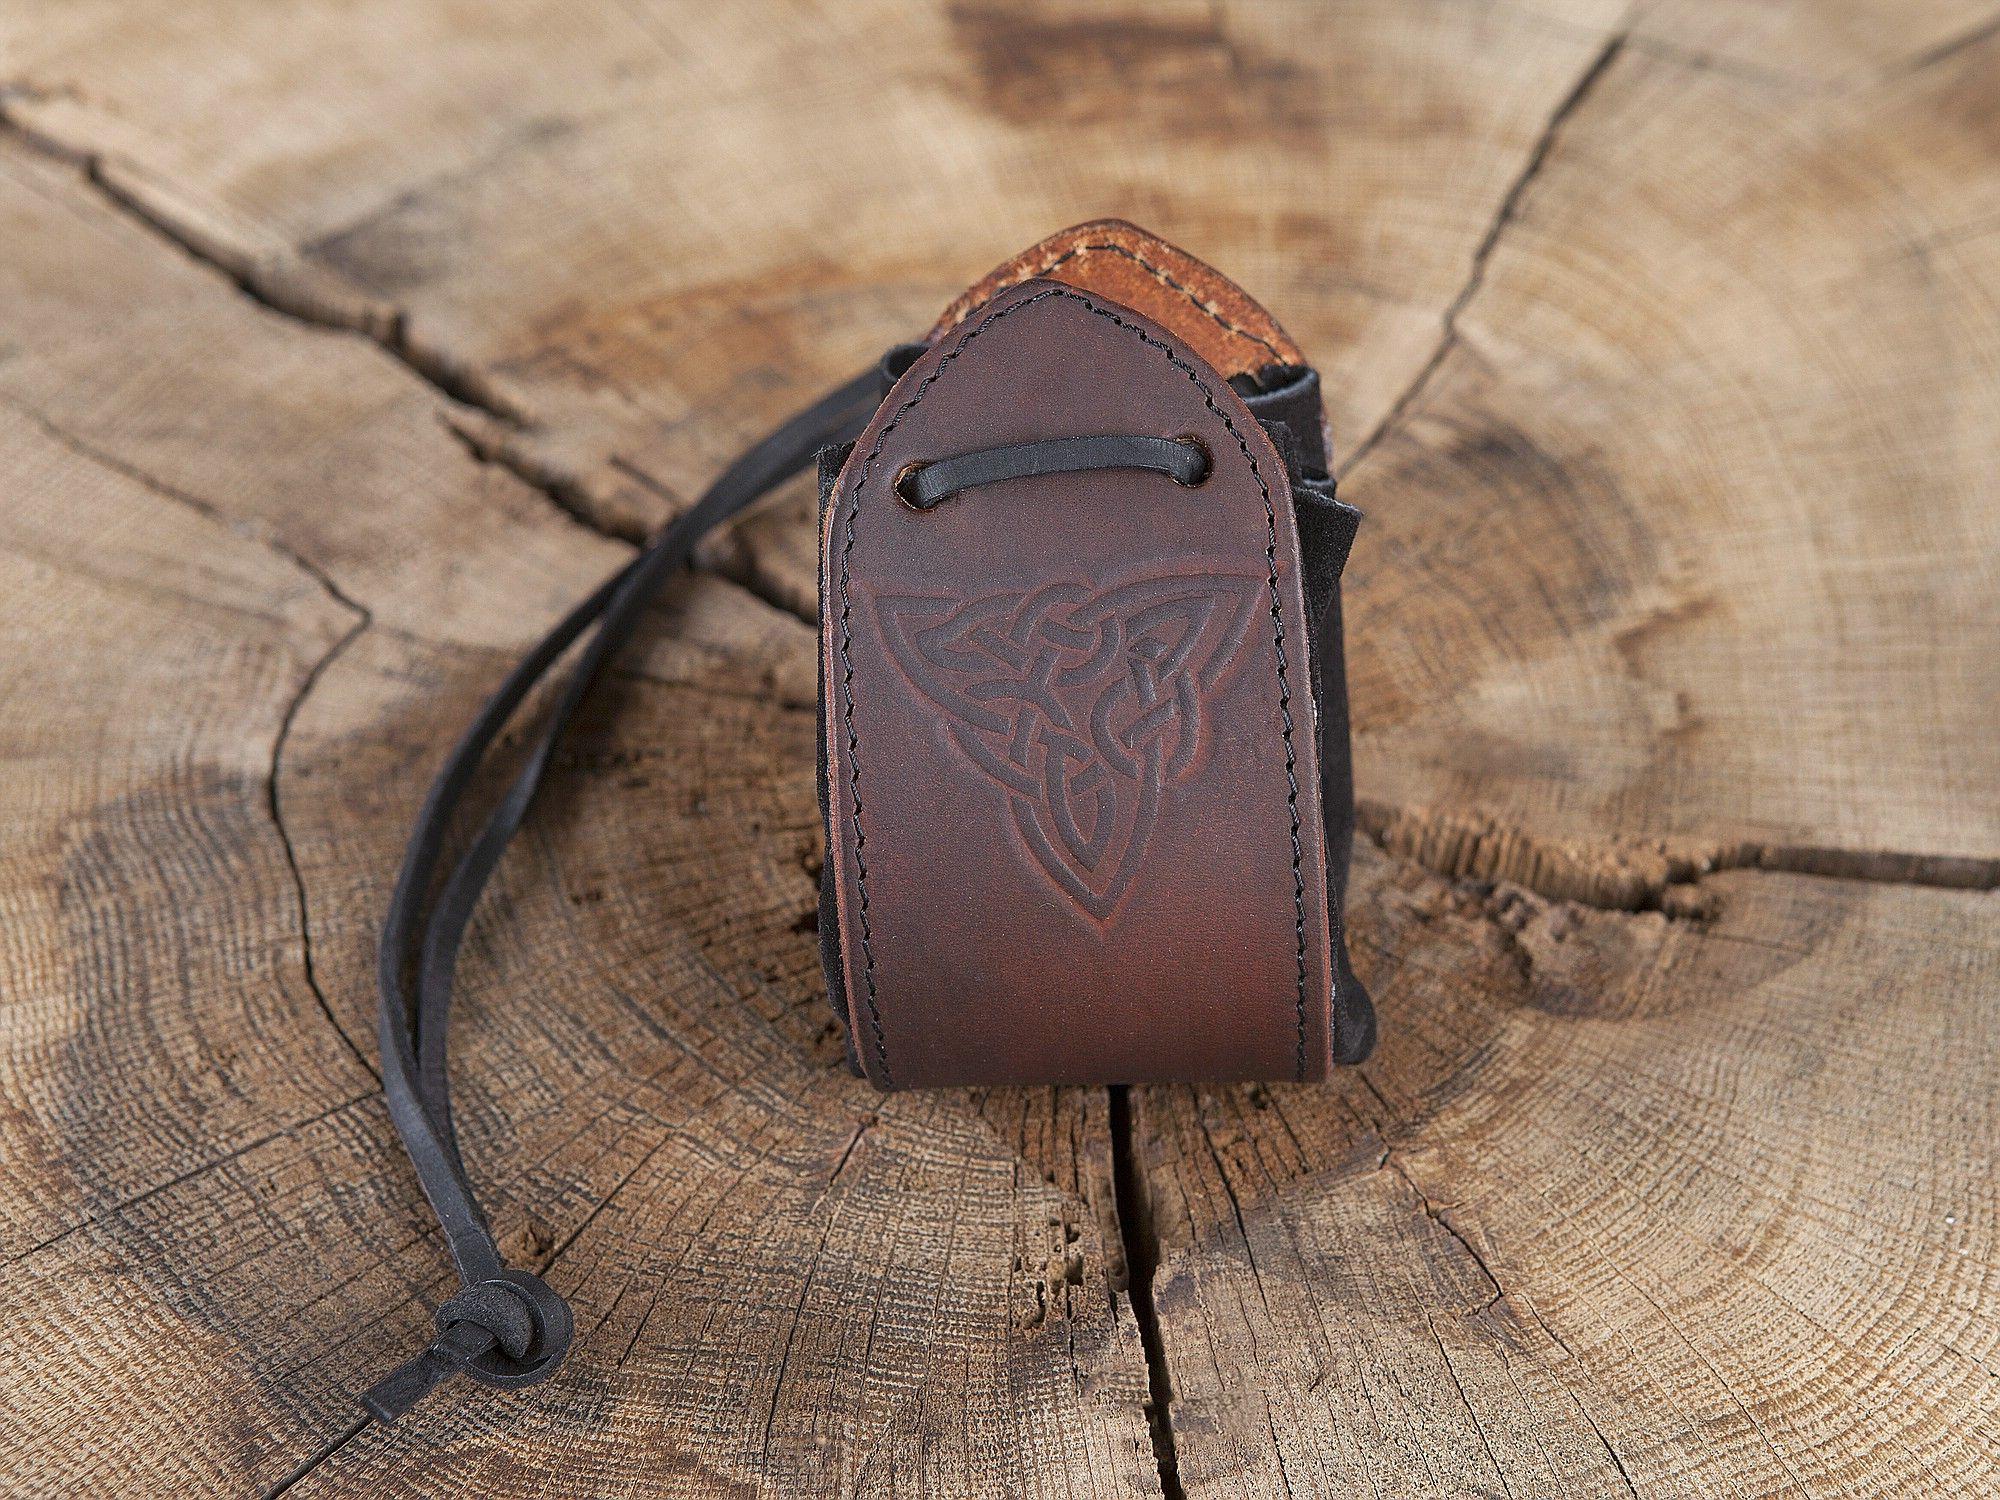 860ea345a442 Sac en cuir noir, motif noeud celtique   ideas craft